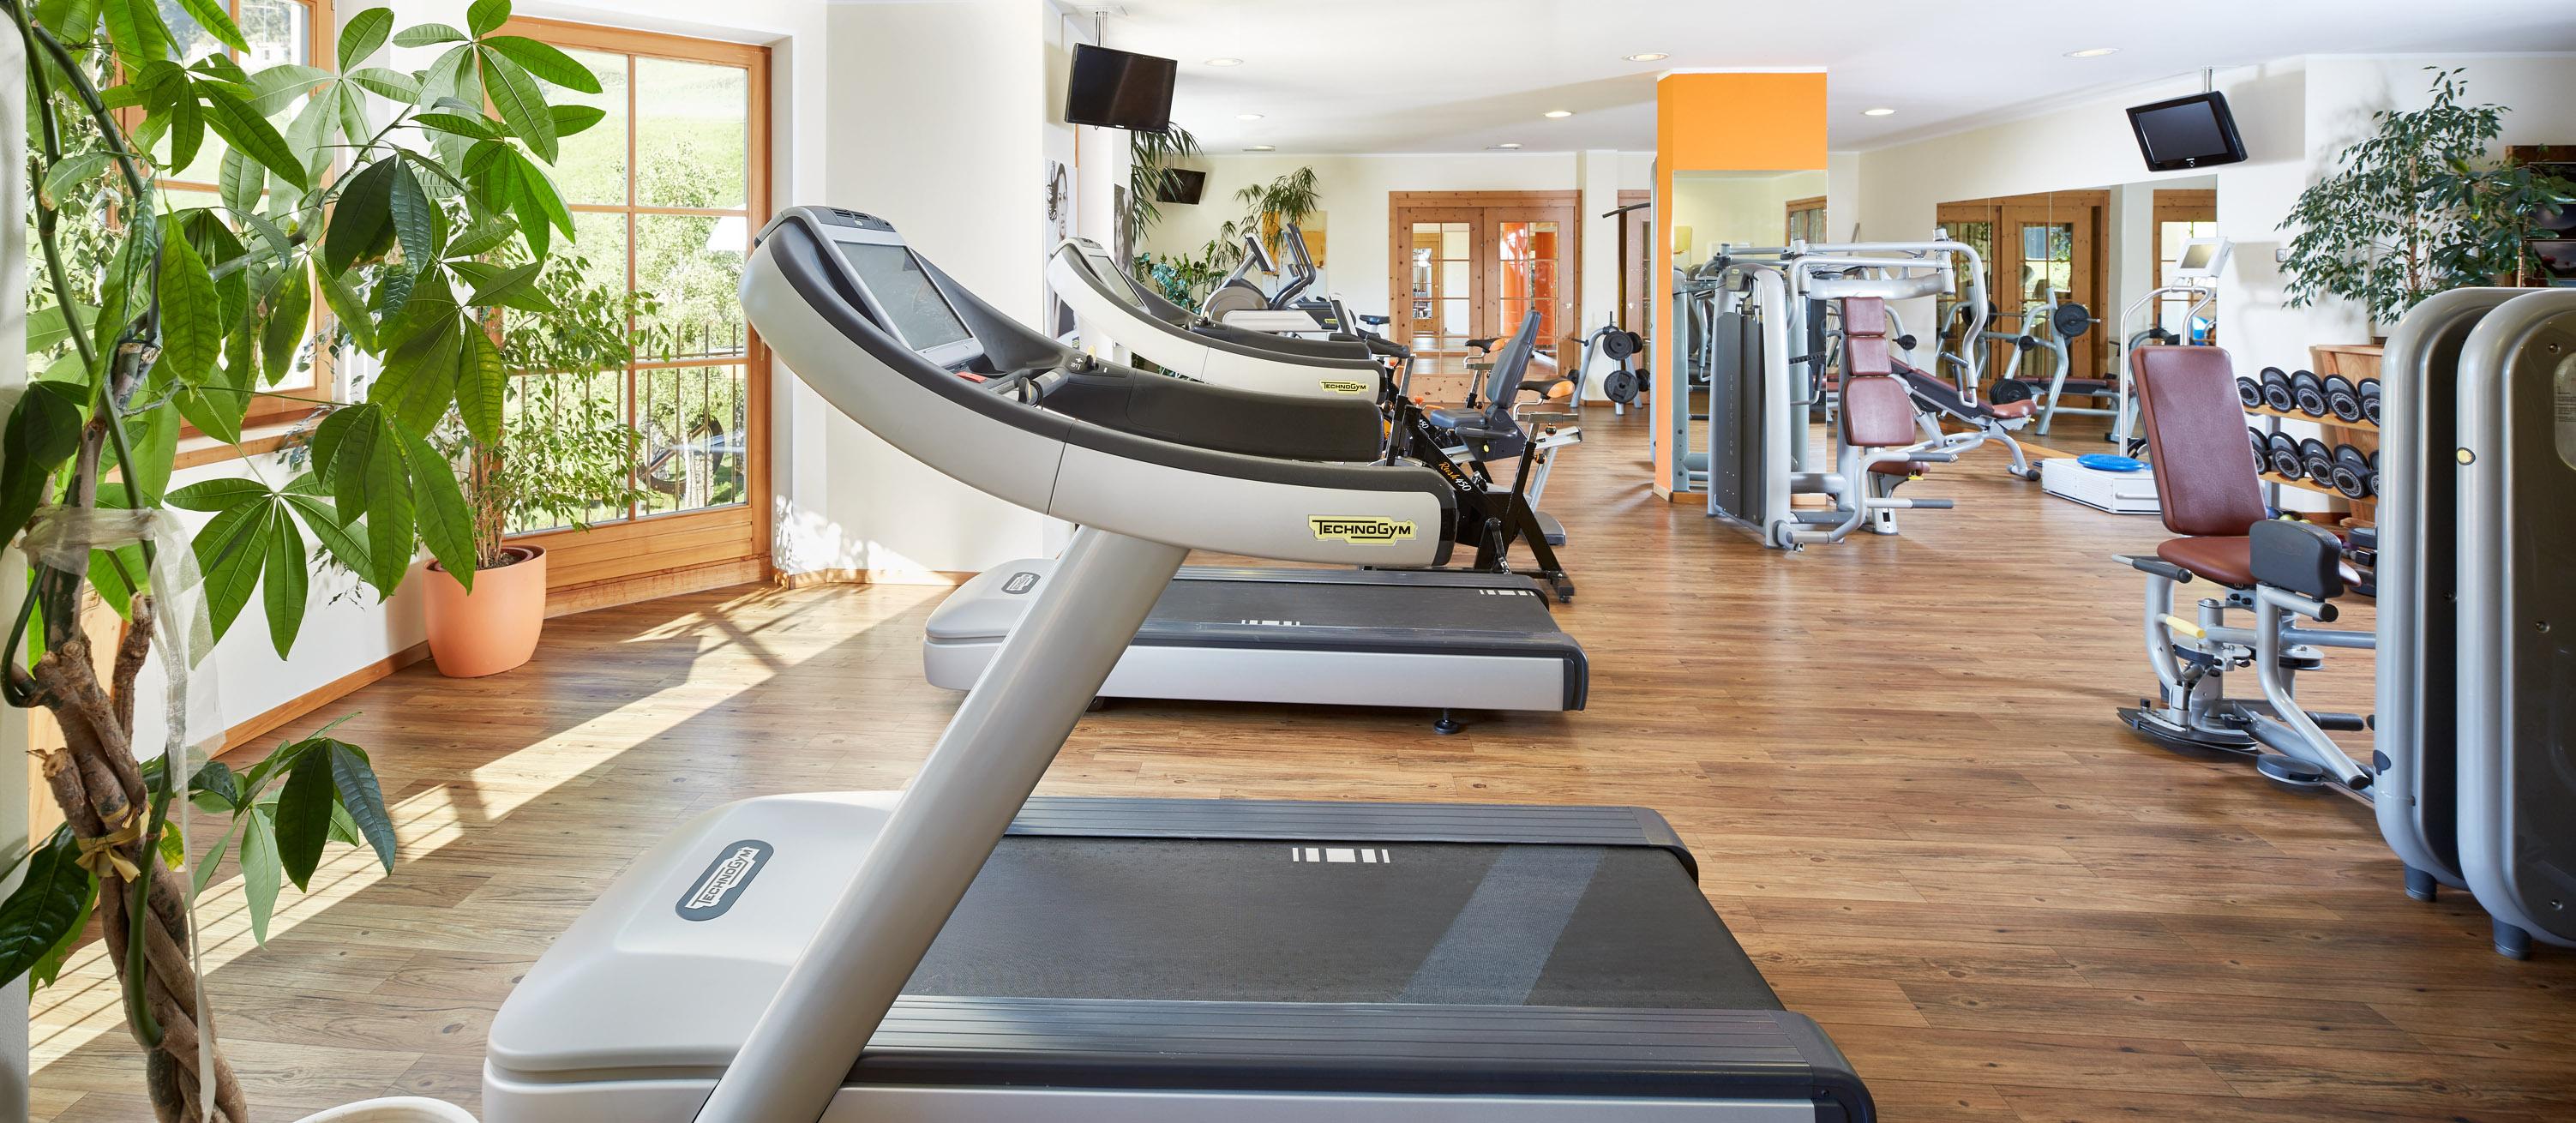 Fitnessraum (c) Michael Huber